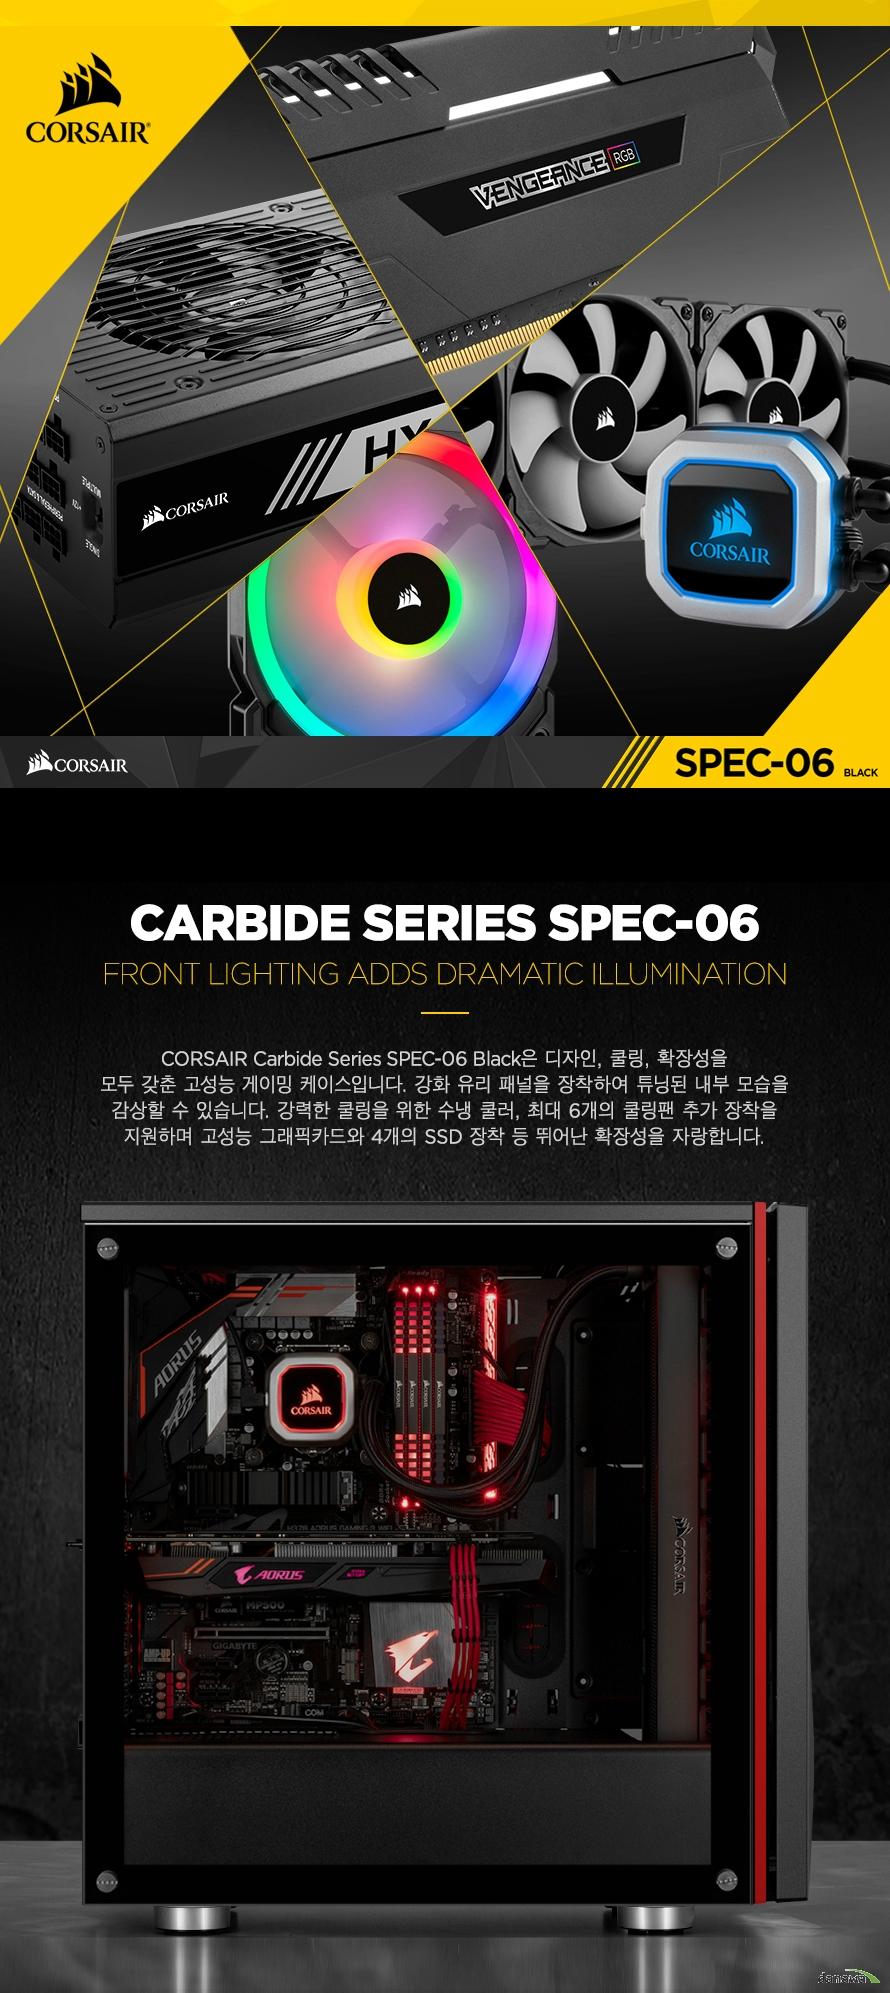 CORSAIR CARBIDE SERIES SPEC-06 BLACK